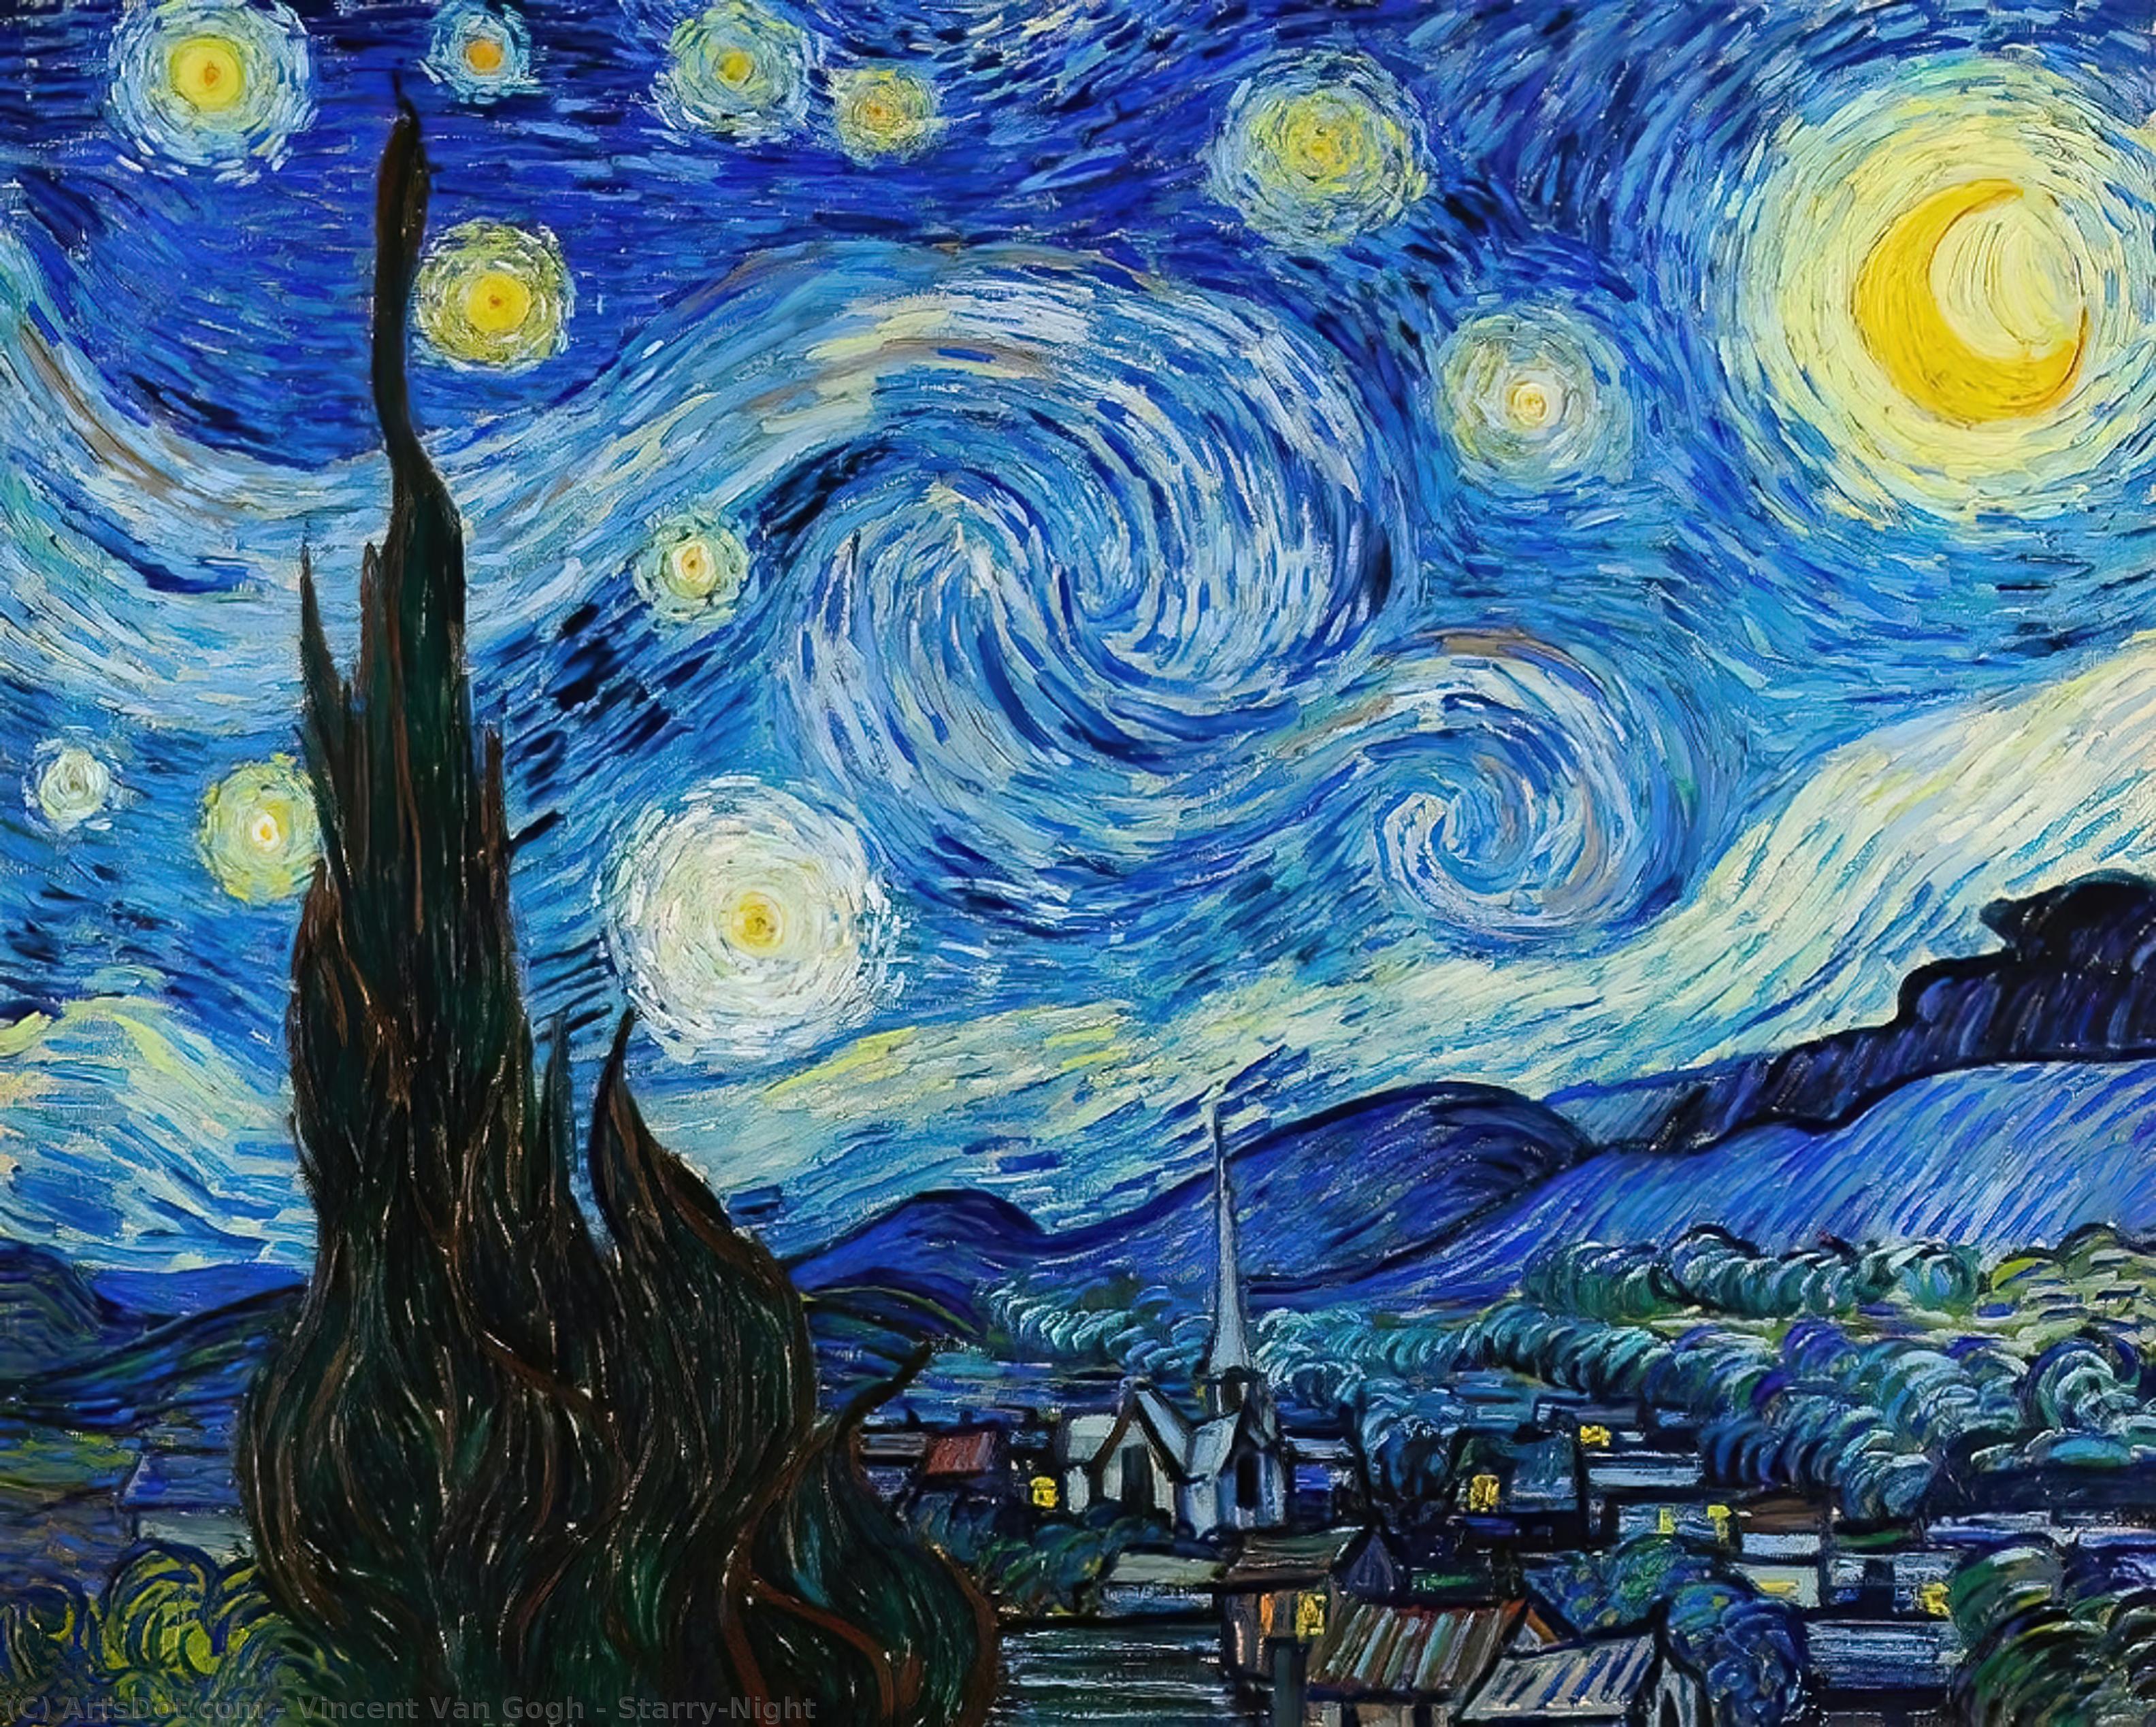 Starry-Night - Vincent Van Gogh